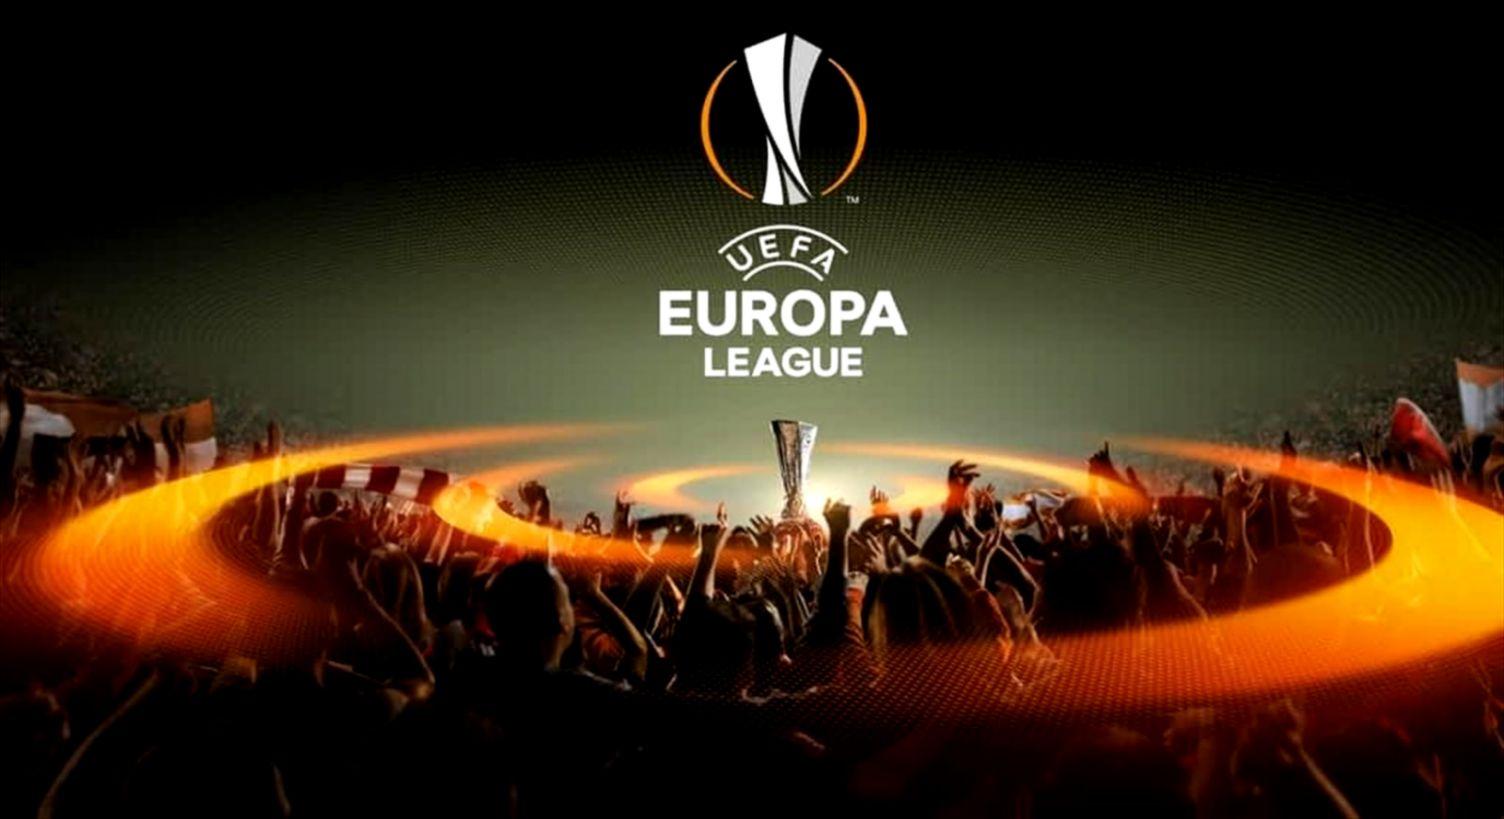 PFC CSKA-Sofia vs Osijek Betting Predictions